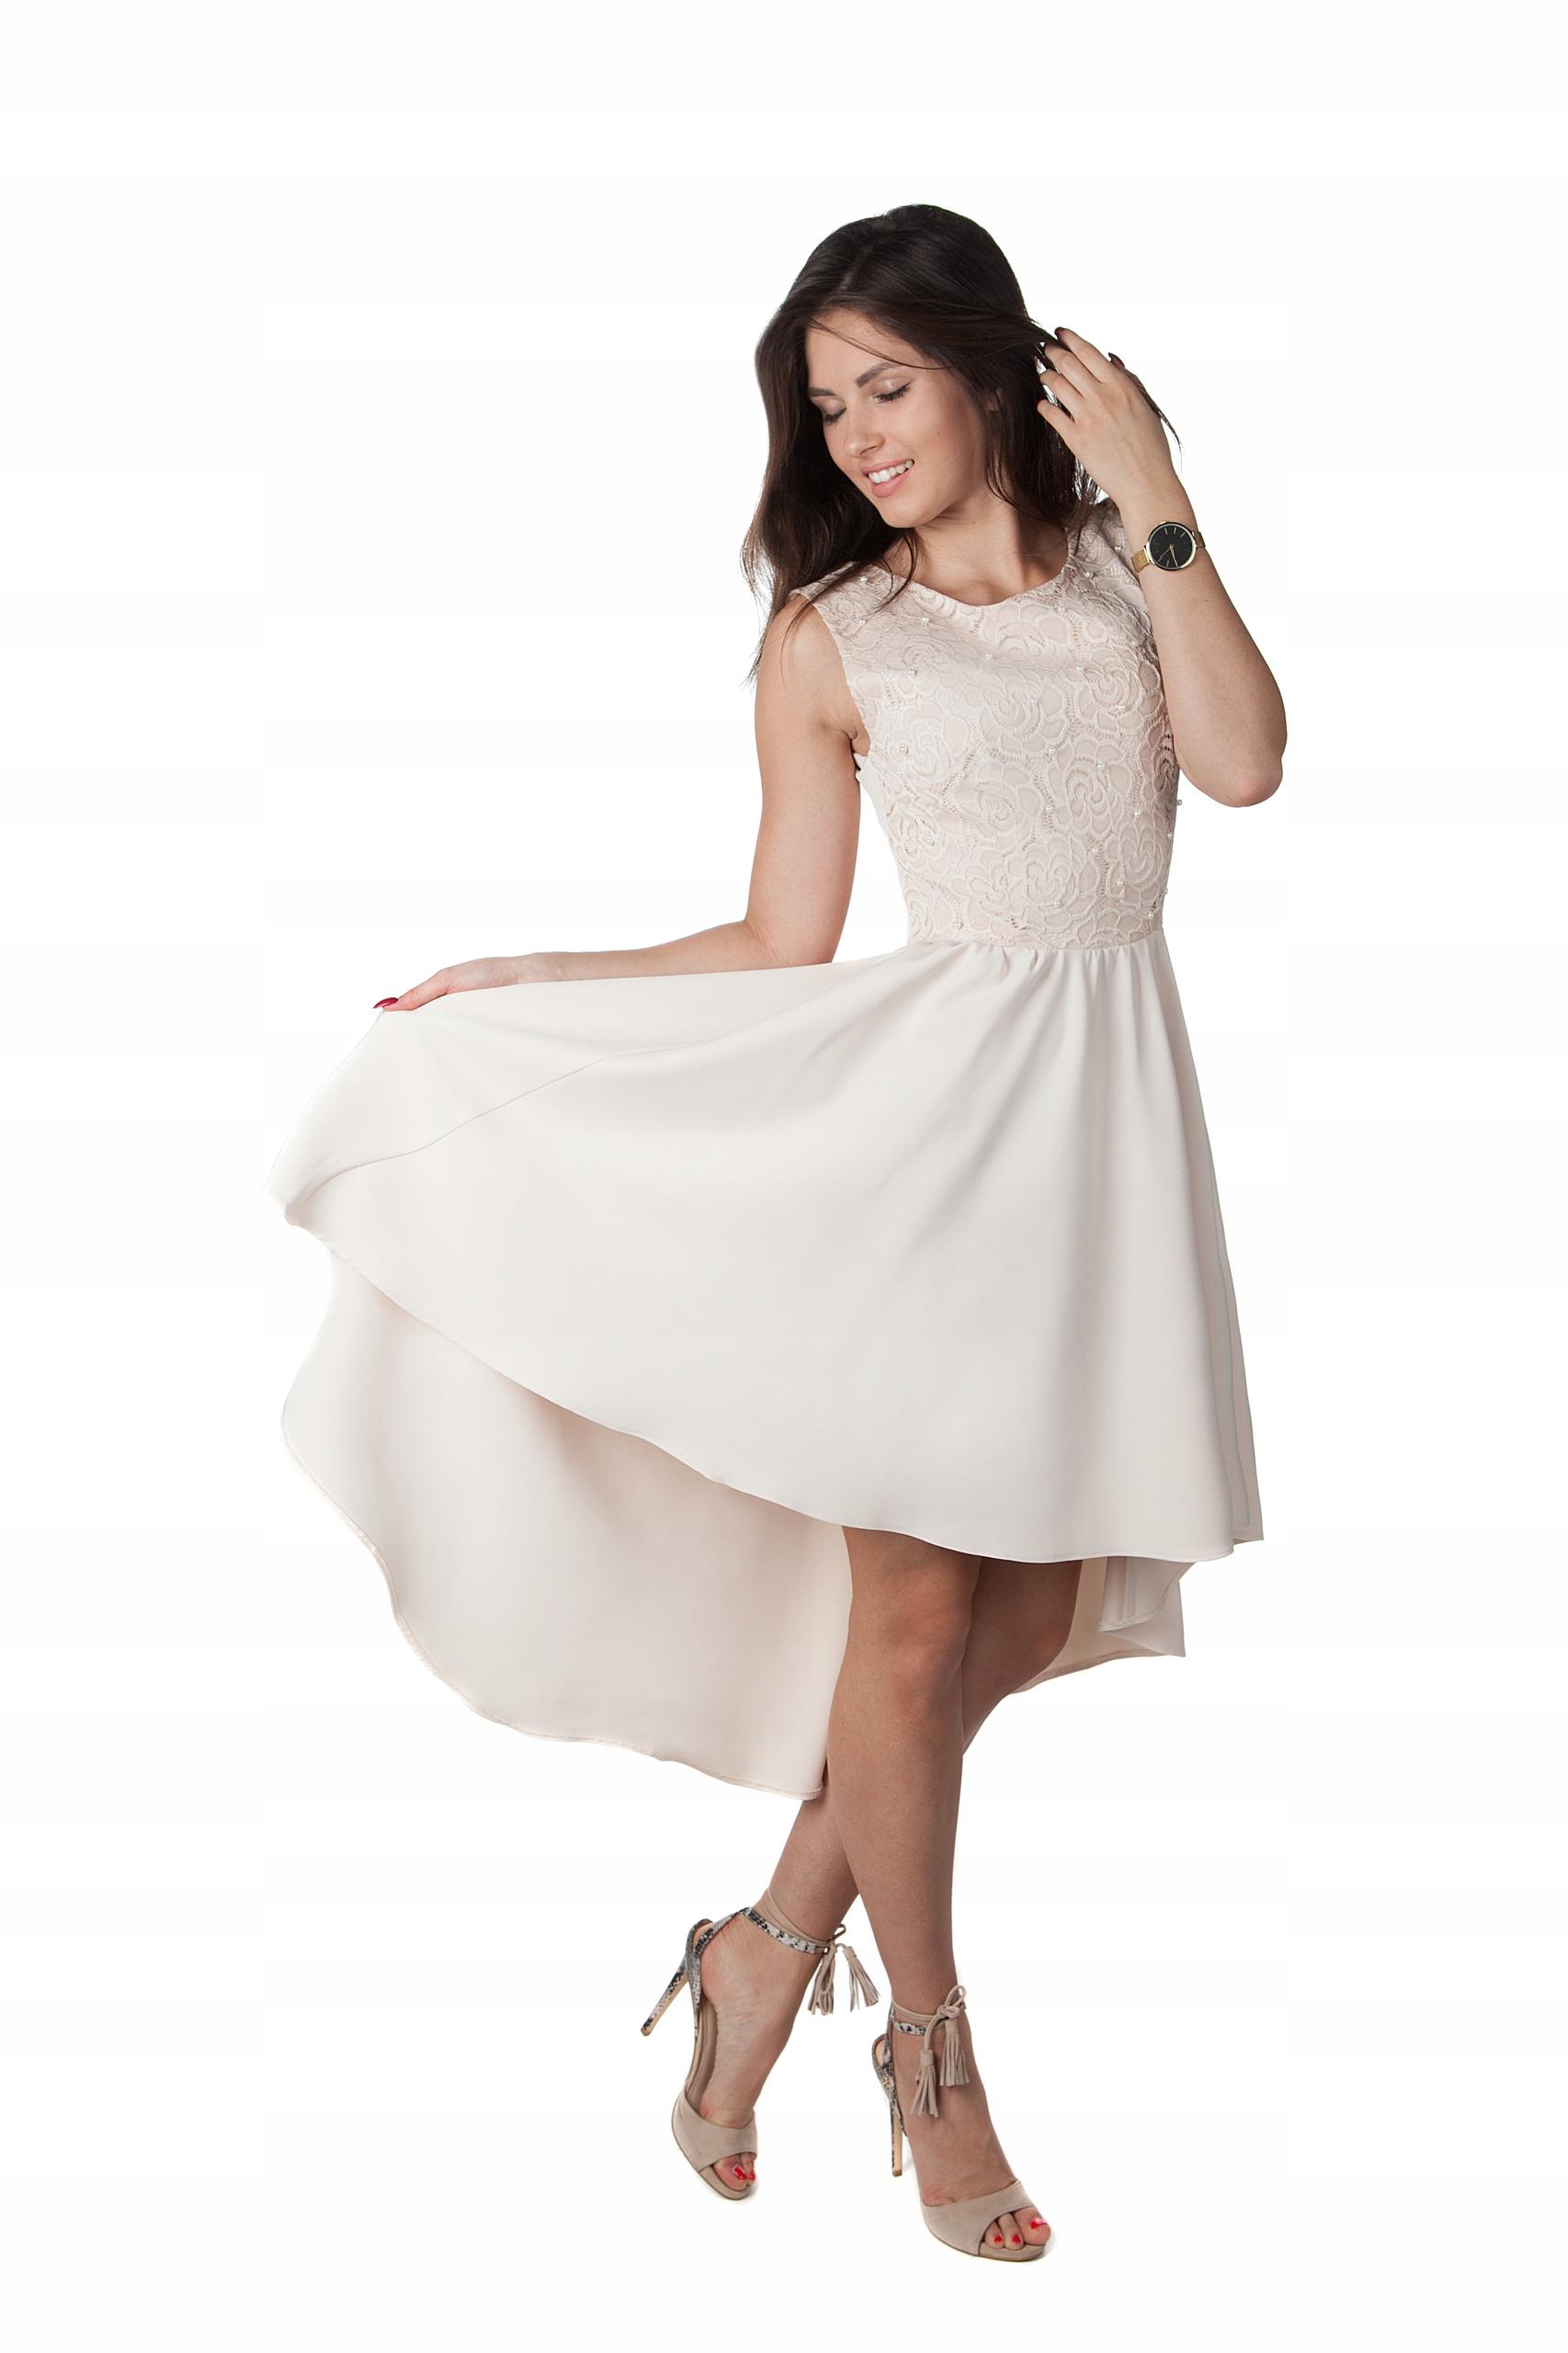 fa3c2cd0e4 Asymetryczna Sukienka Koronka Perełki Wesele R 42 7516559992 - Allegro.pl